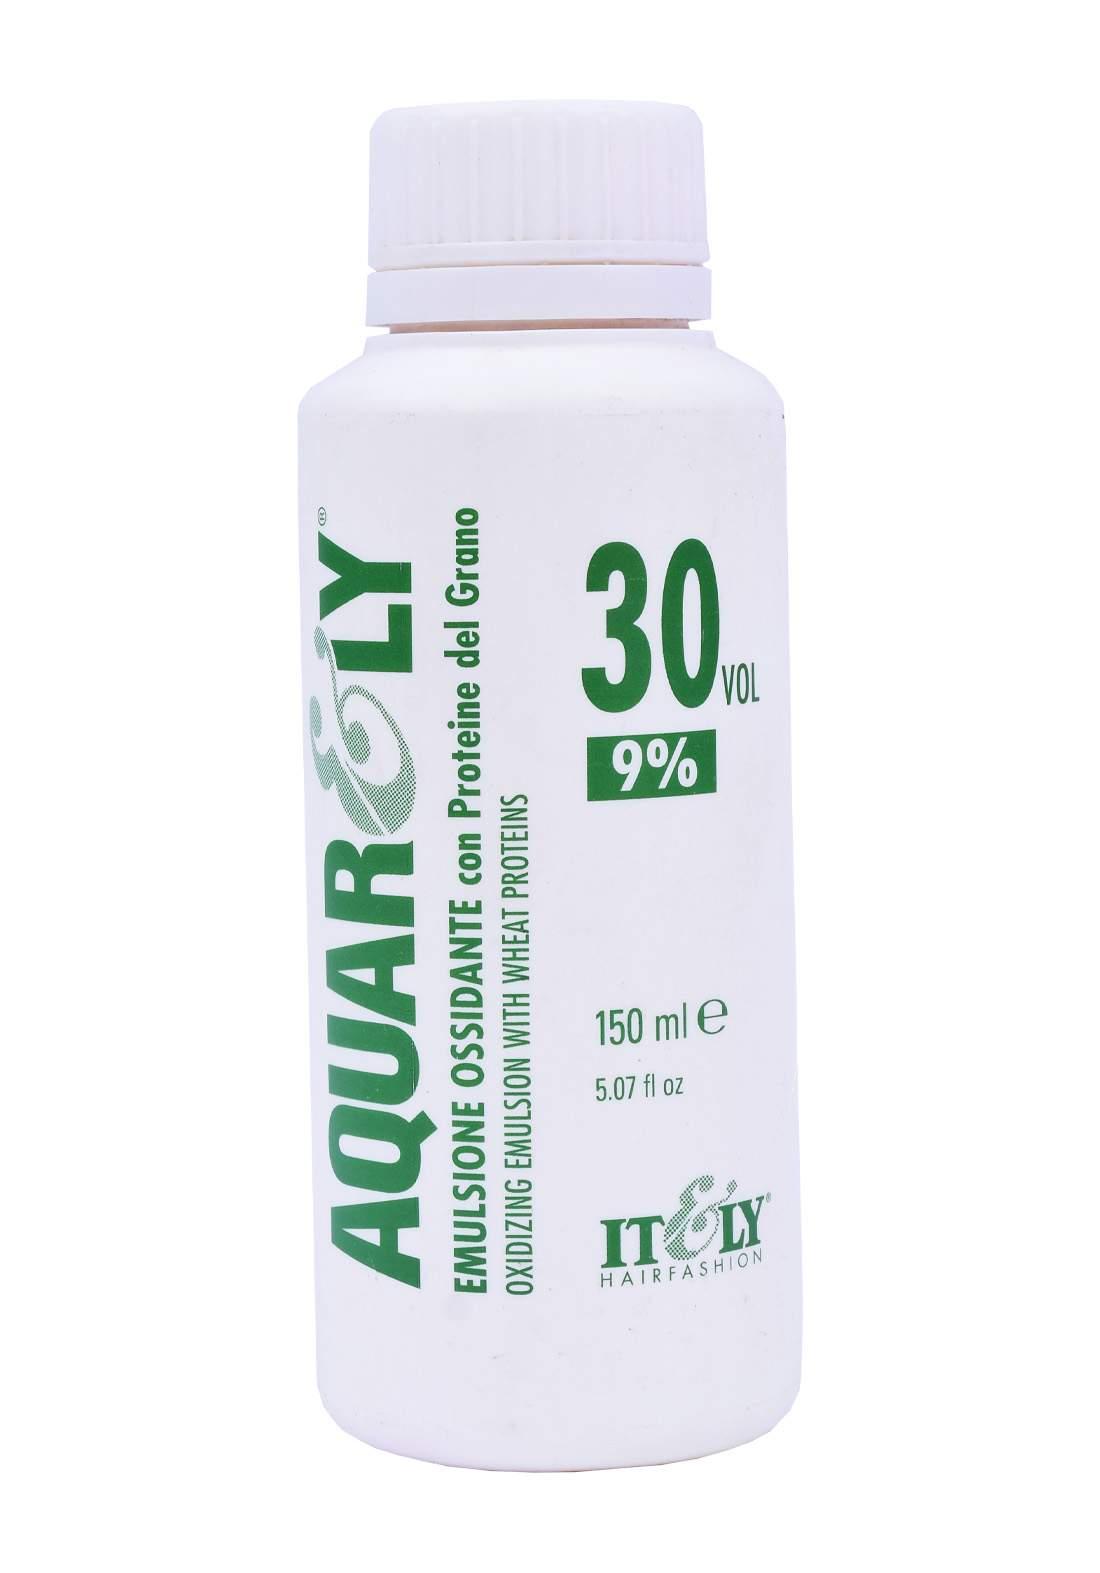 Aquarly Cream Oxidant 30VOL Cream 9% 150 ml كريم اوكسجين لصبغ